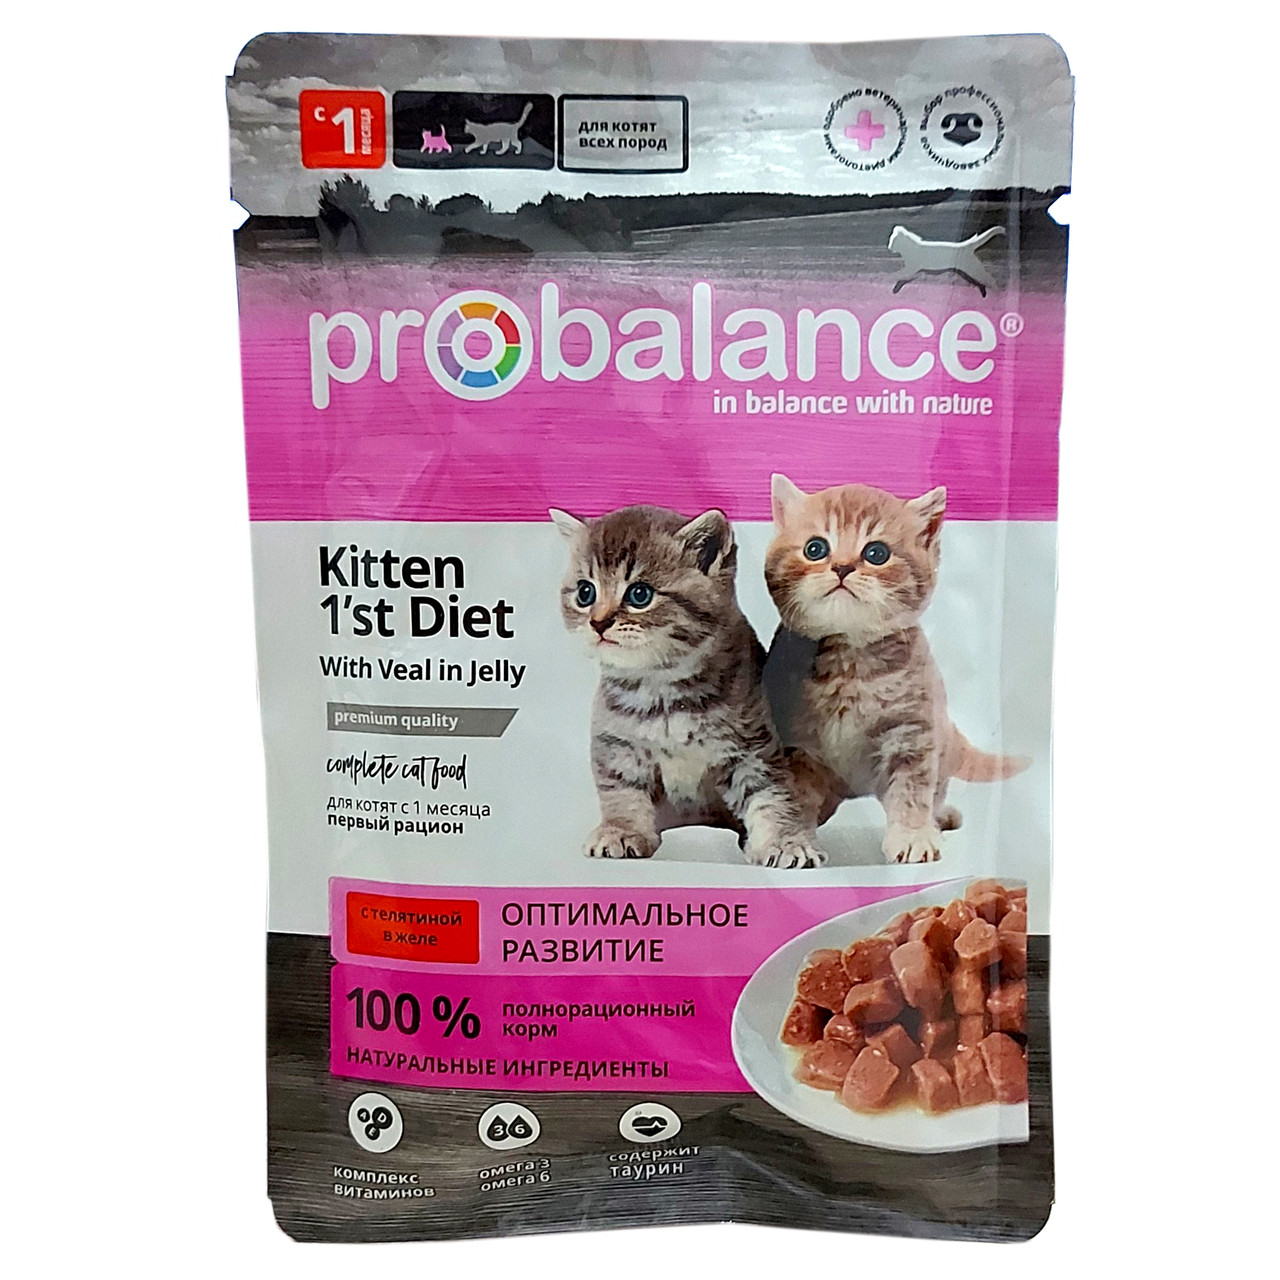 Пробаланс Влажный корм для котят, Телятина